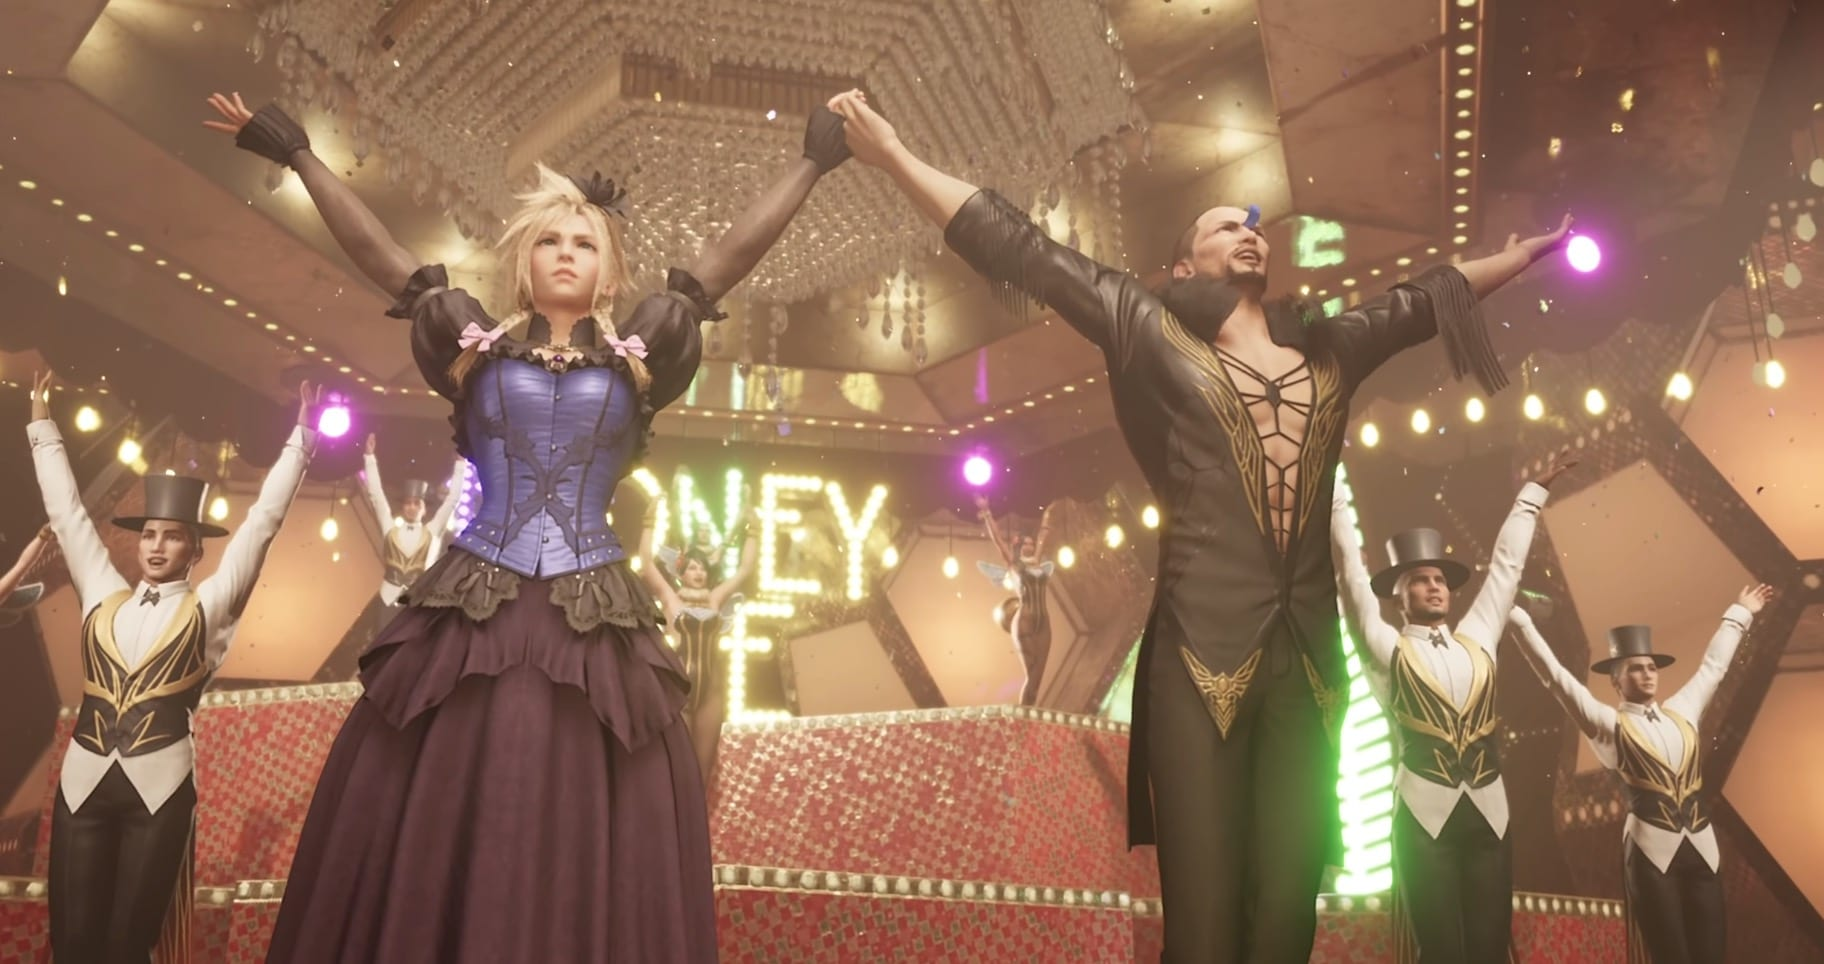 video games, final fantasy vii remake, dancing